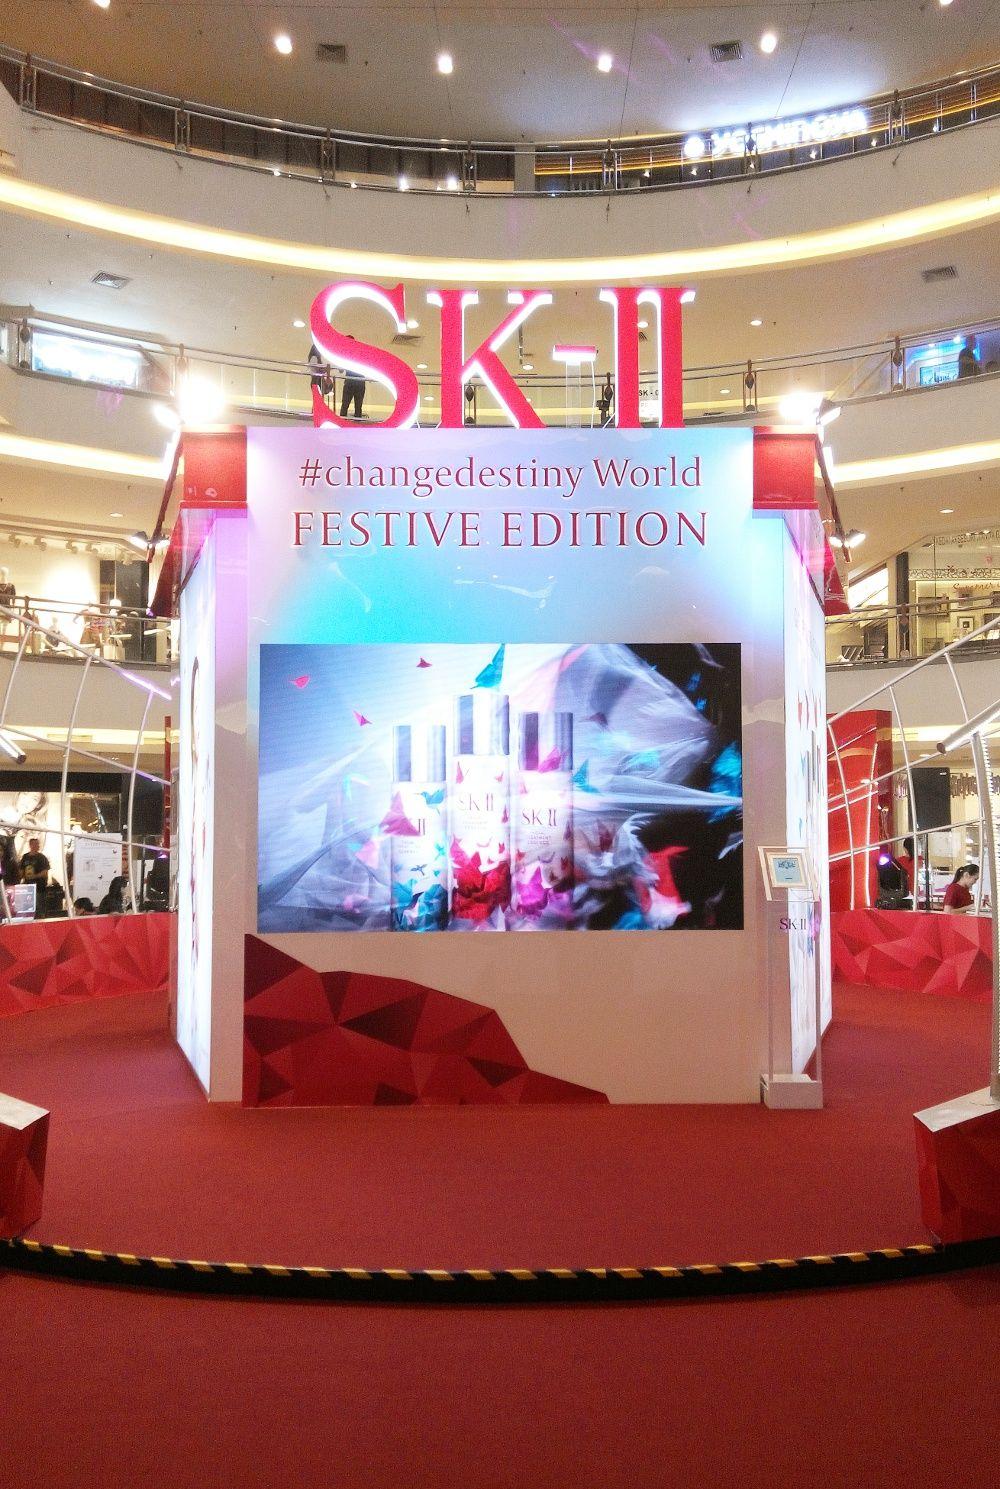 SKII image by サンディー Interactive, Frame, Interior